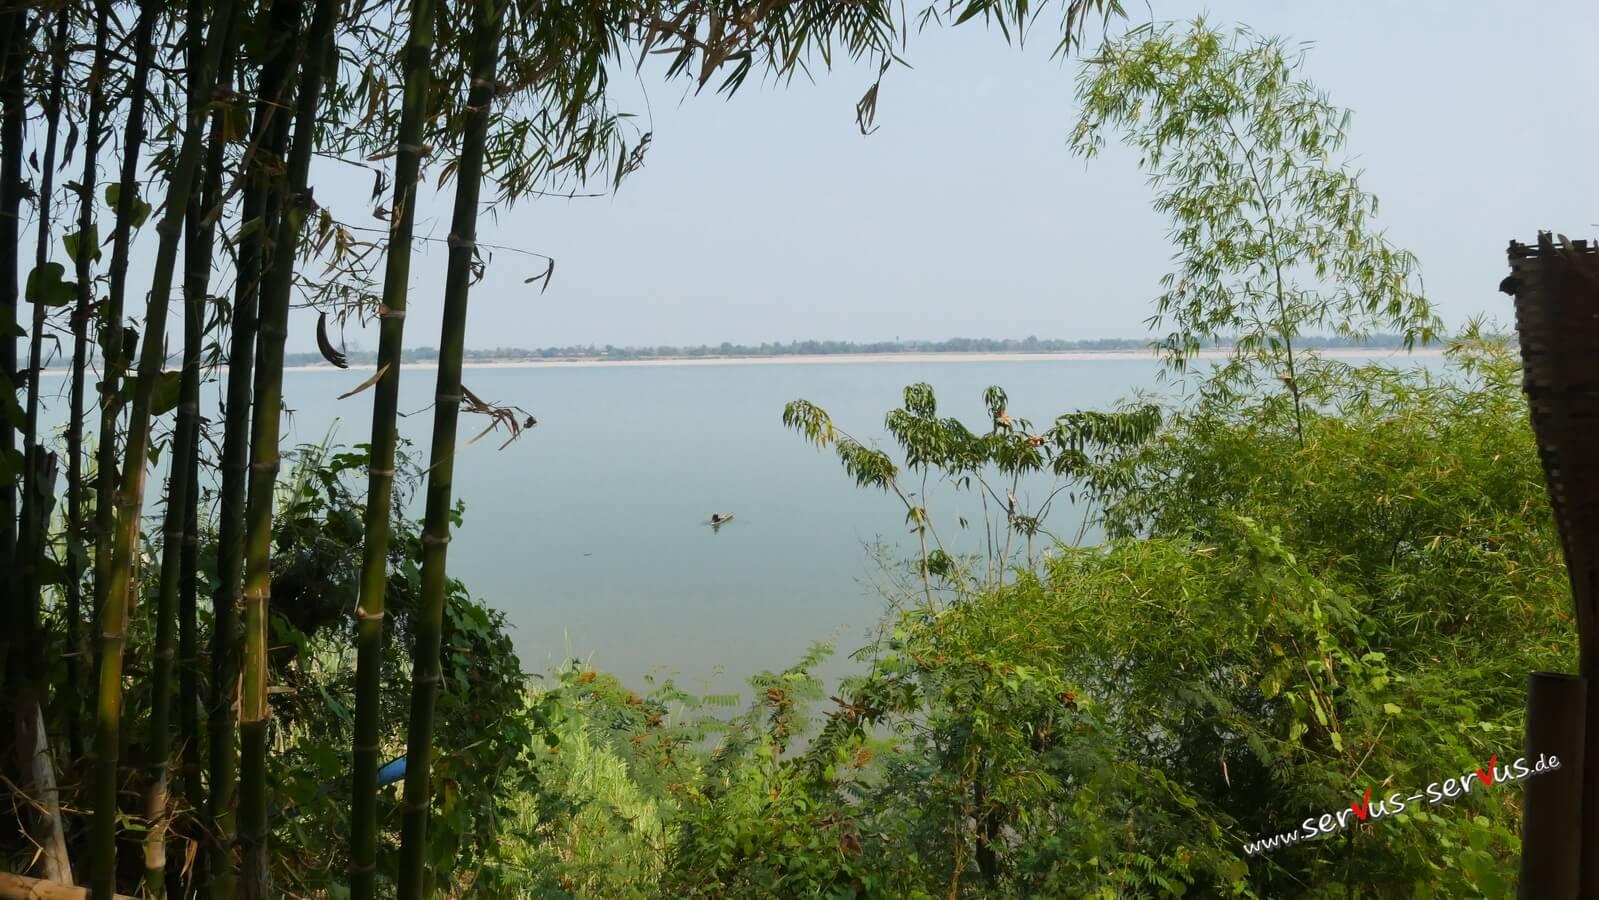 Mekong, Laos, Champasak